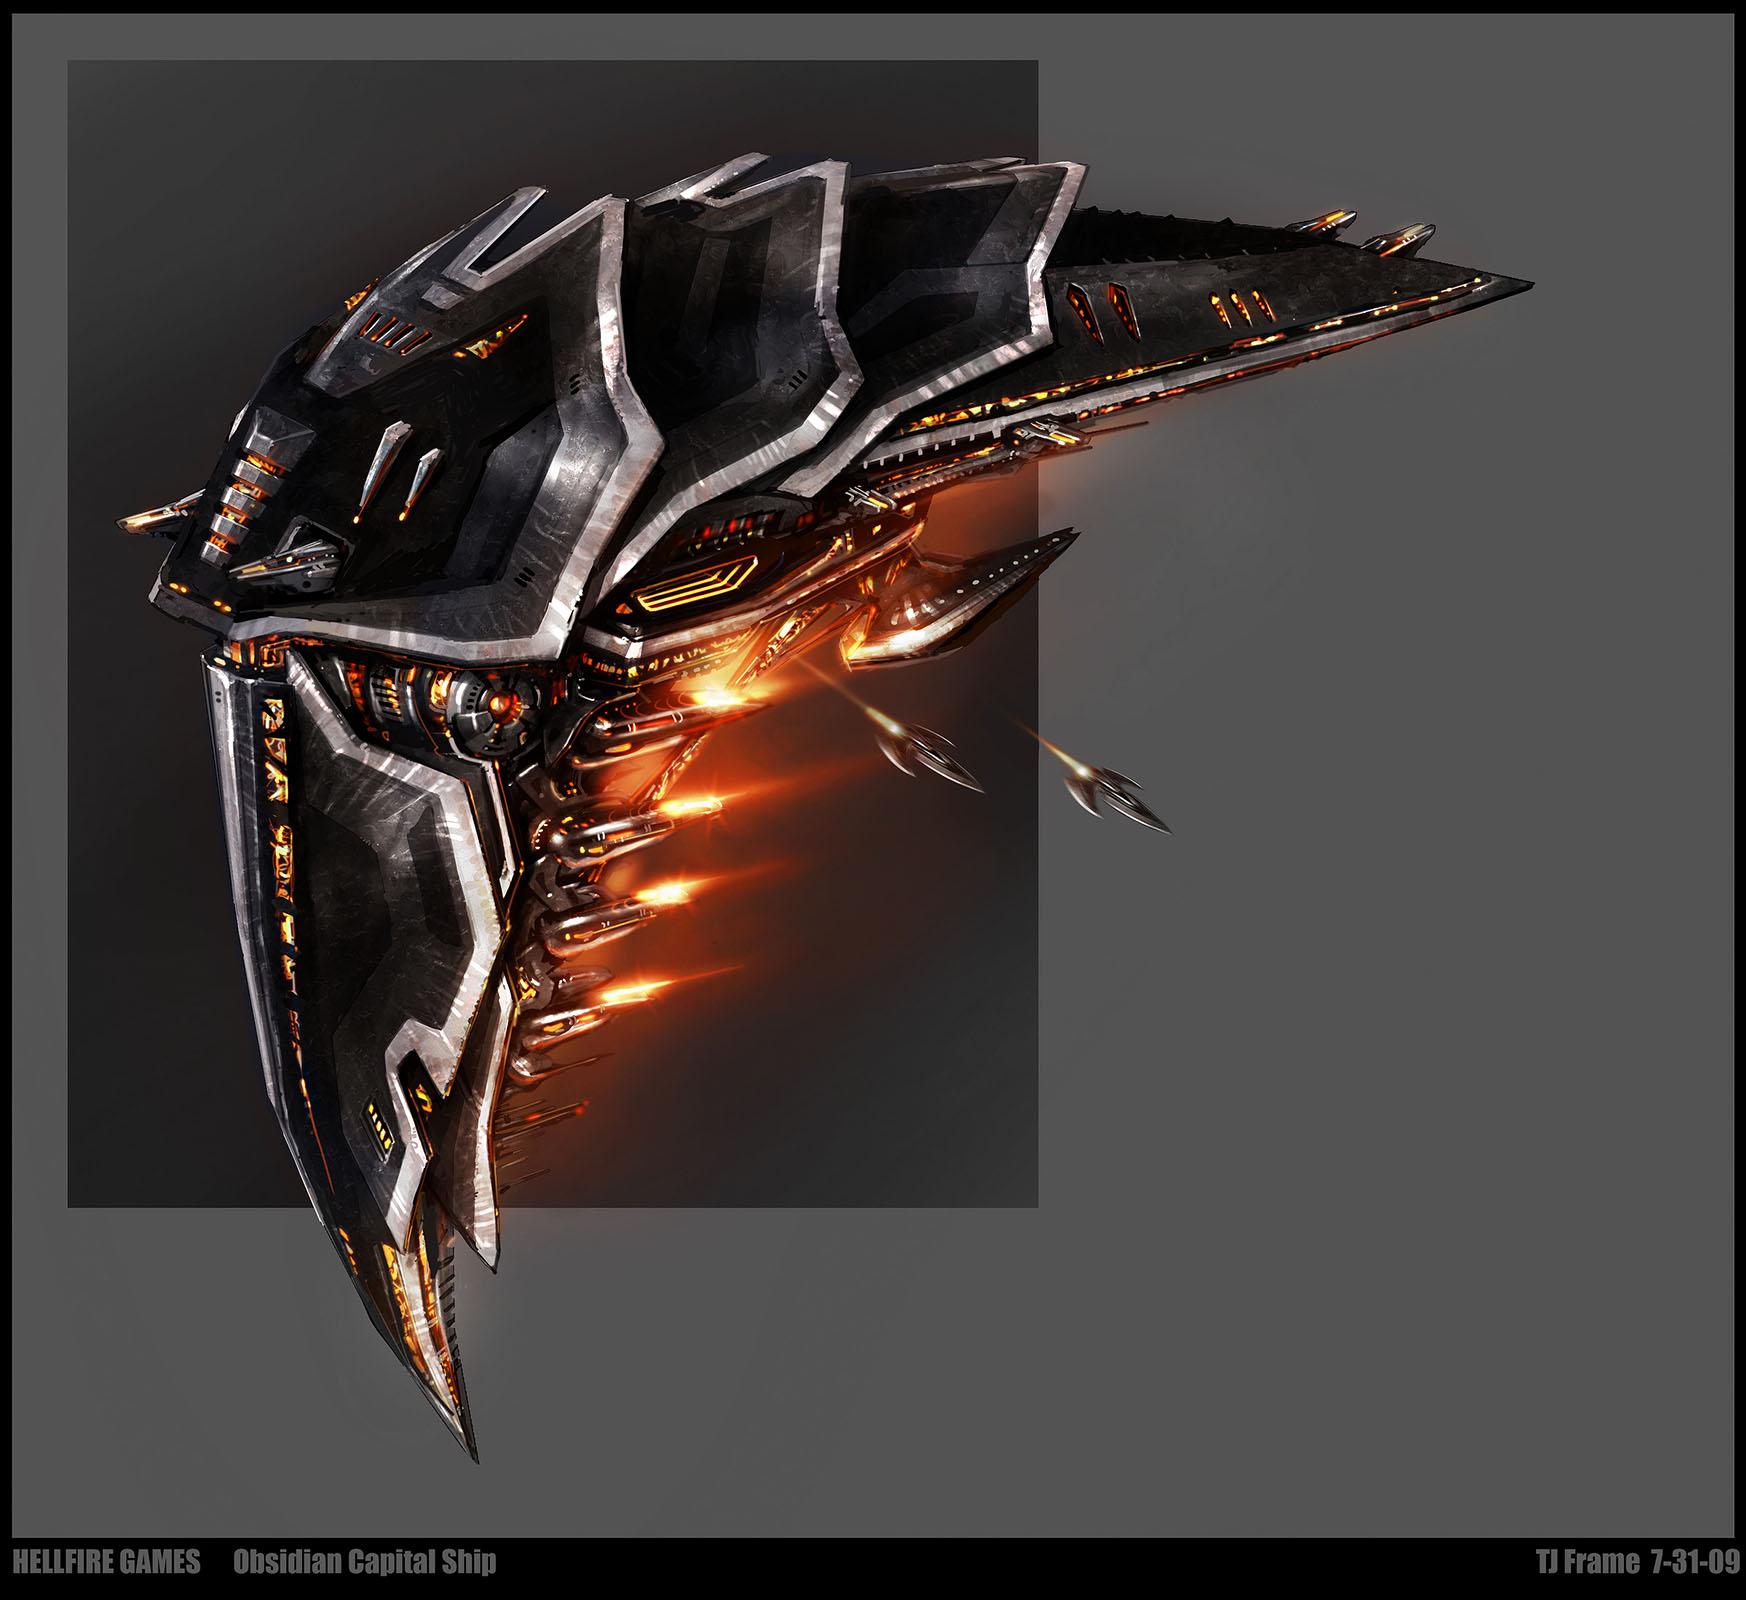 TJFrame-Art_HellfireGames_CapitalShip.jpg